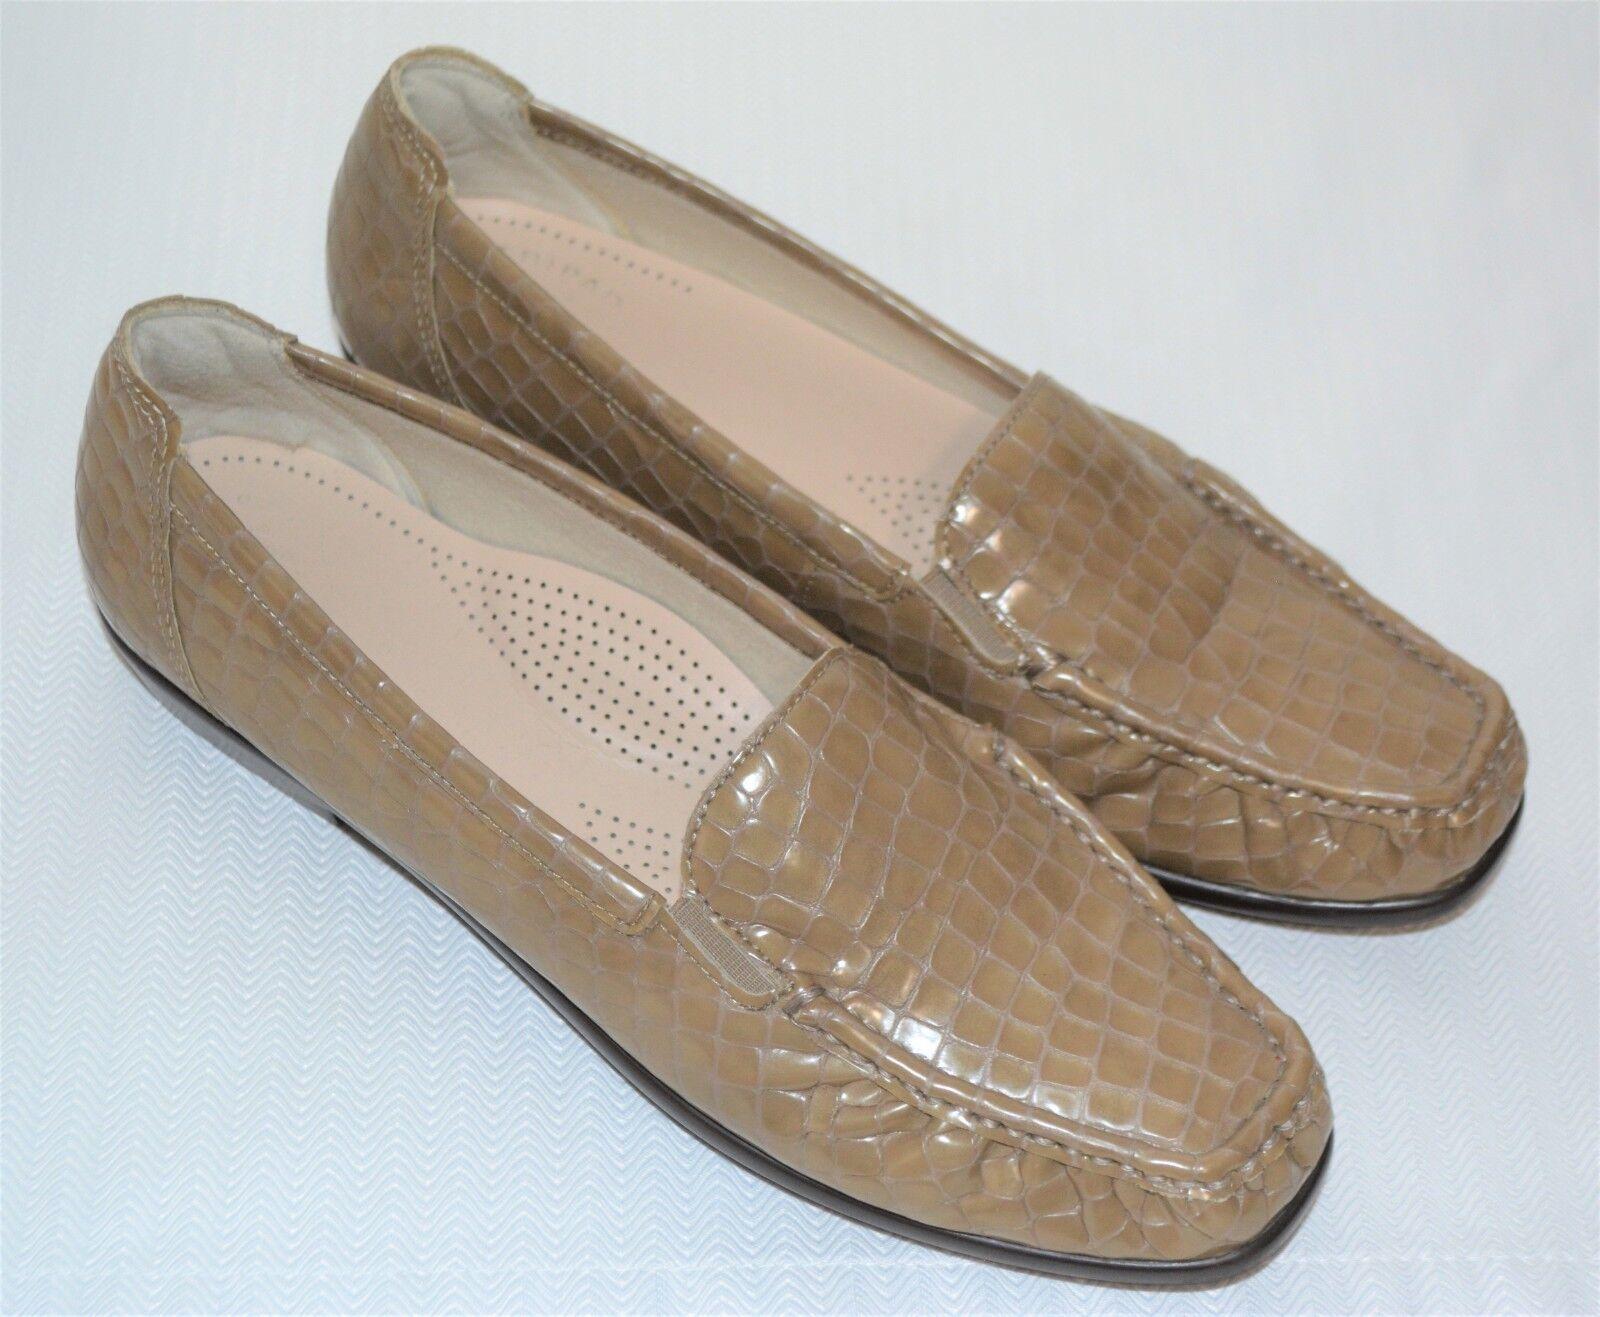 Womens SAS JOY Shoes Taupe Croc Slip On Loafers Flats Size 10 N Narrow